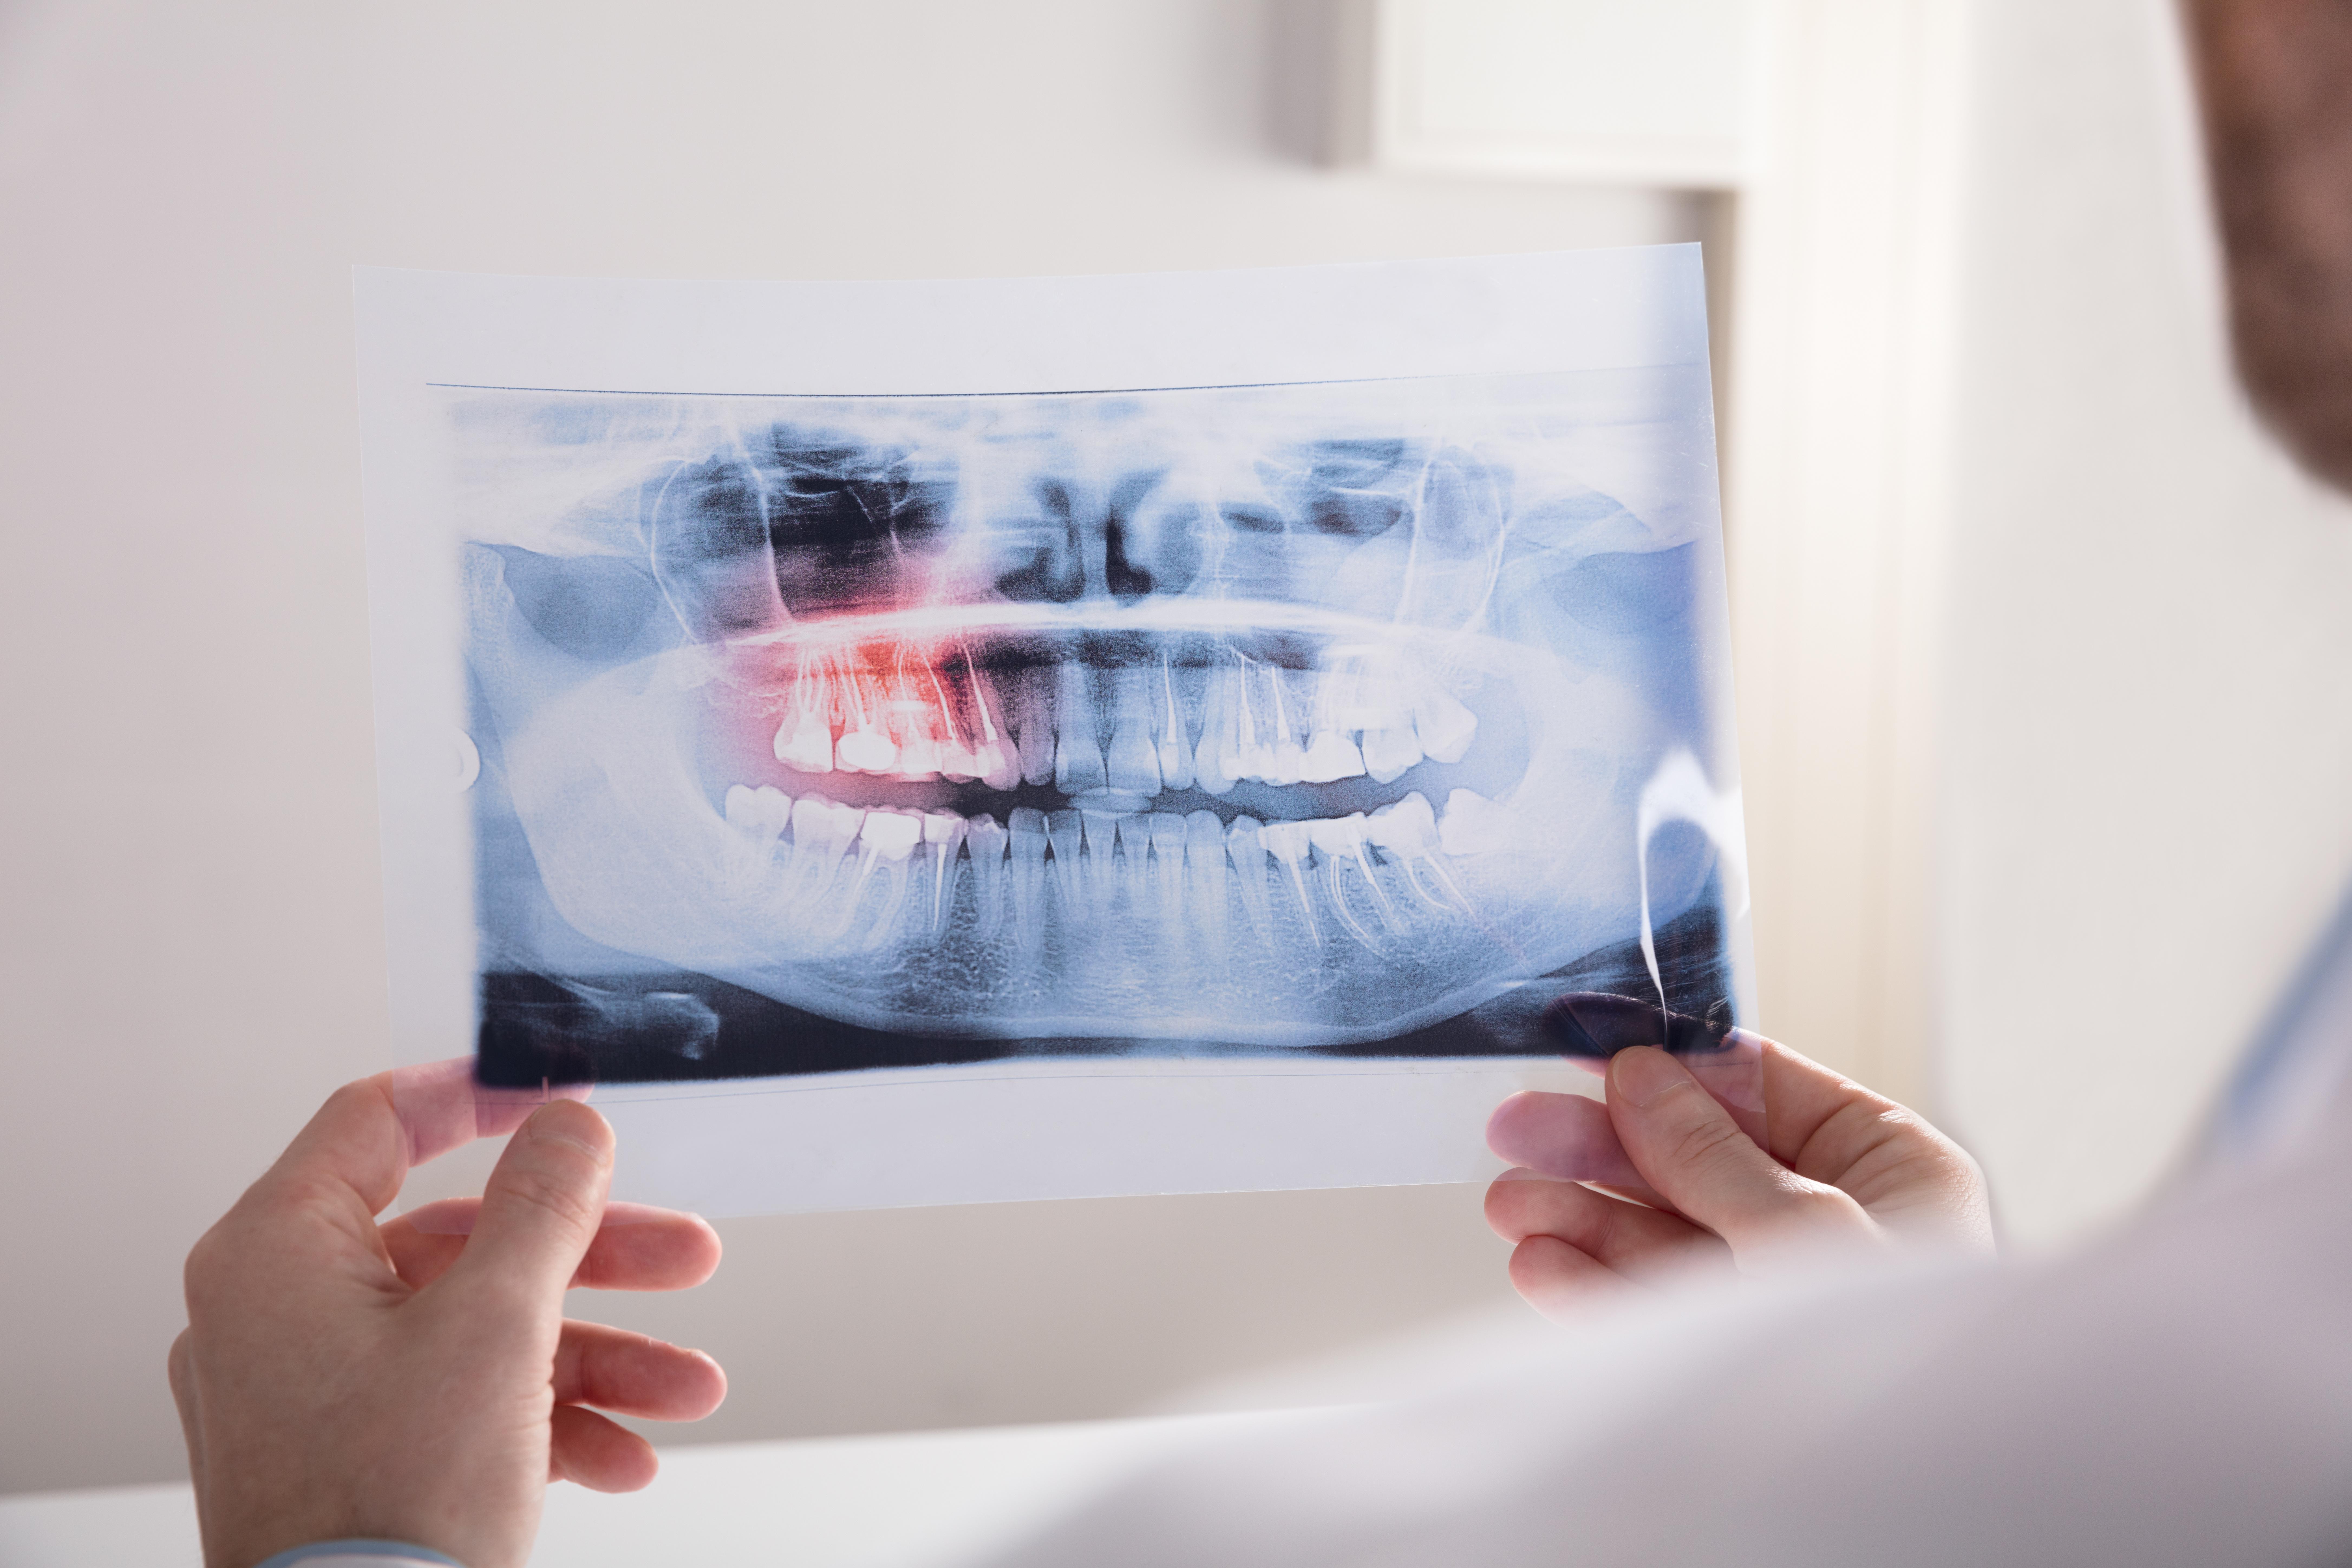 What Does 'Impacted Wisdom Teeth' Mean? kensington court clinic